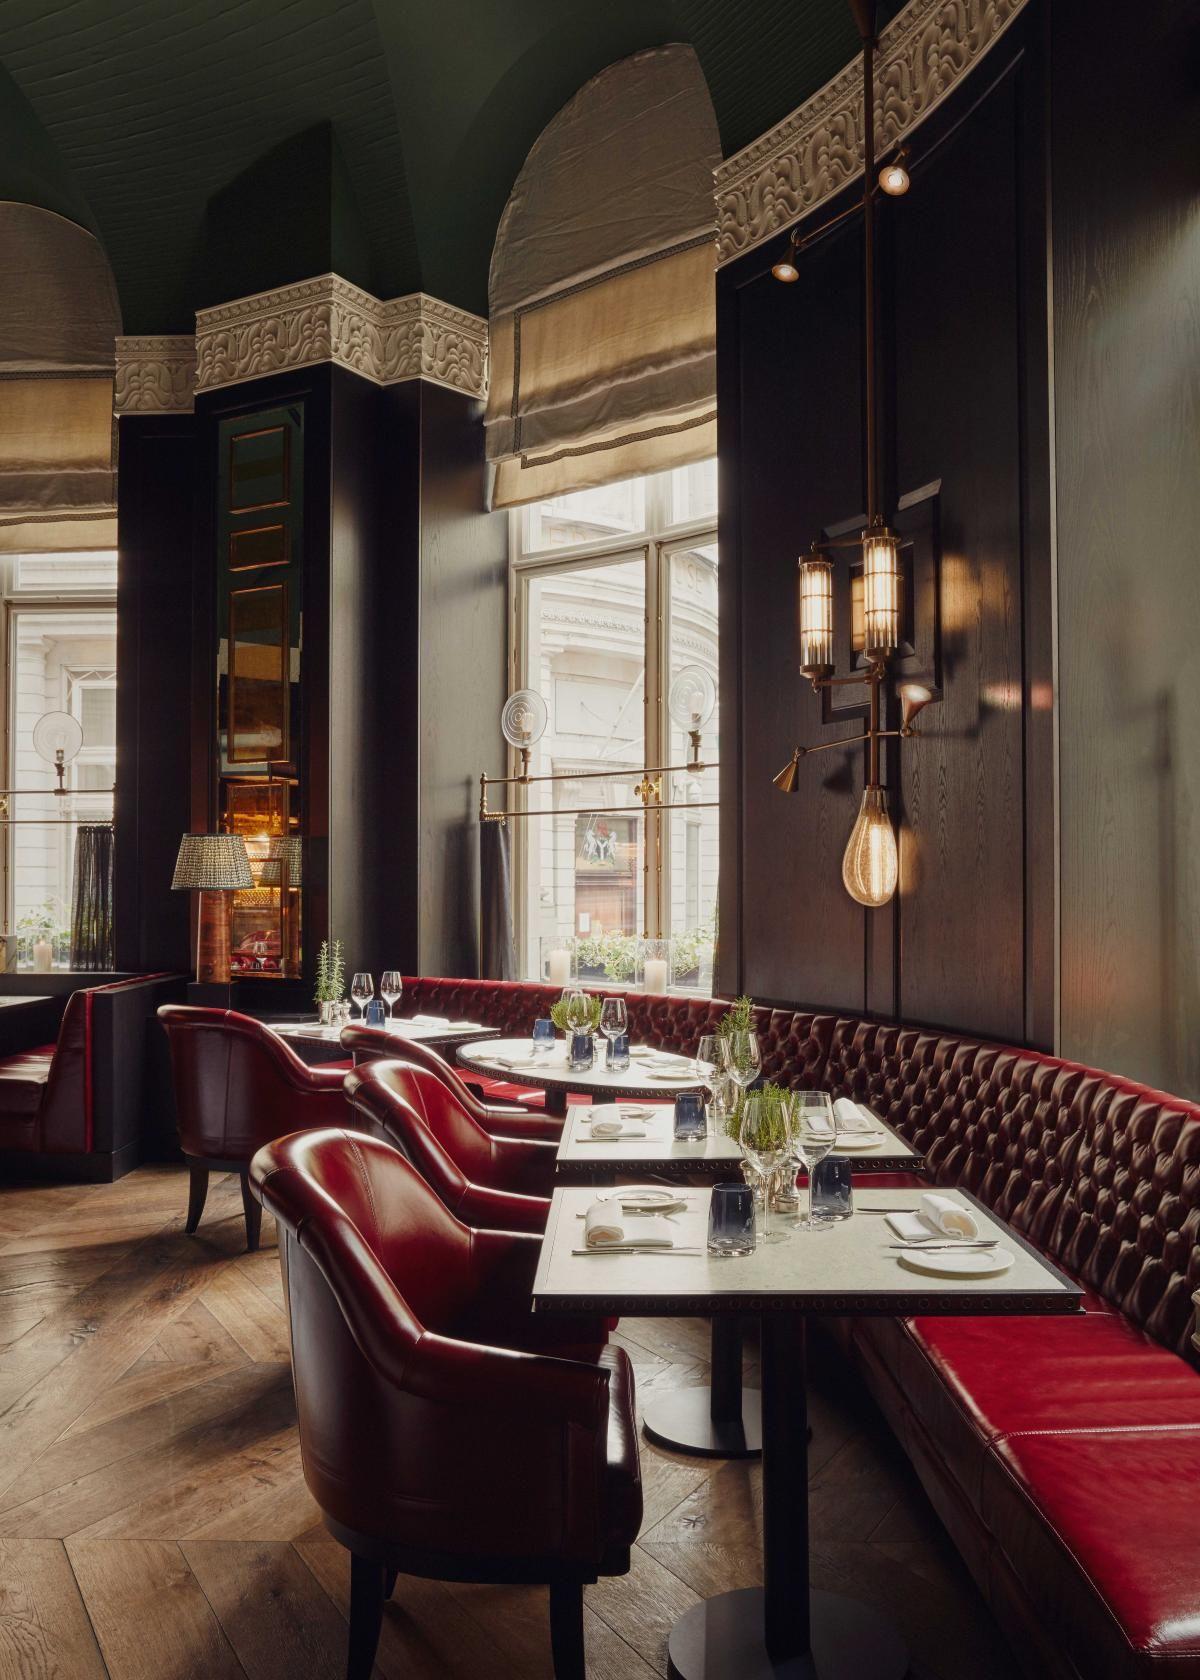 Kerridge S Bar Grill Restaurant London Uk Restaurants